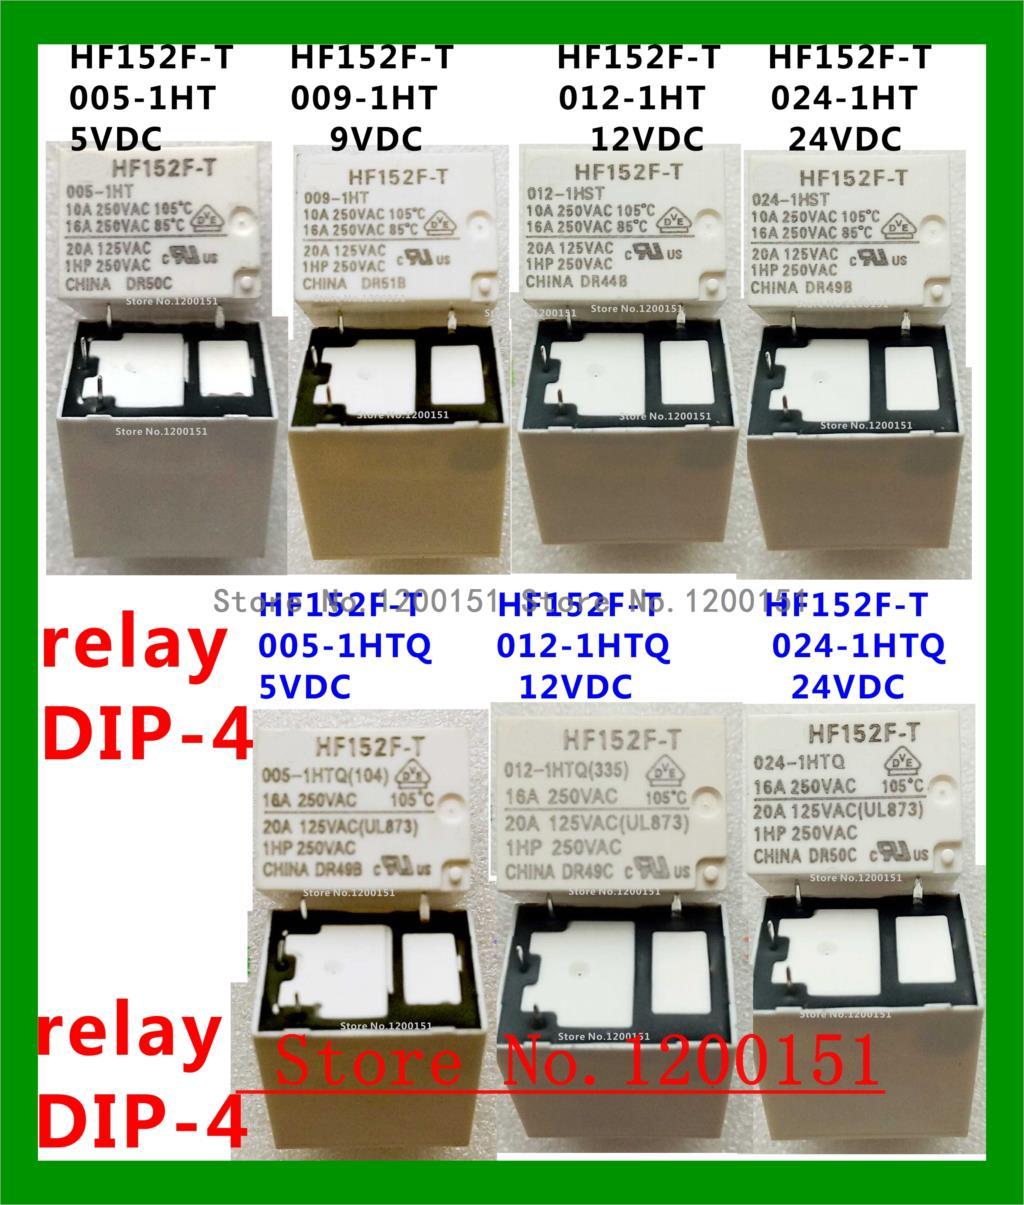 HF152F HF152F-T 005-1HT 009-1HT 012-1HT 024-1HT 005-1HTQ 012-1HTQ 024-1HTQ Relay DIP-4 009-1HPTQ 012-1HPTQ Relay DIP-5